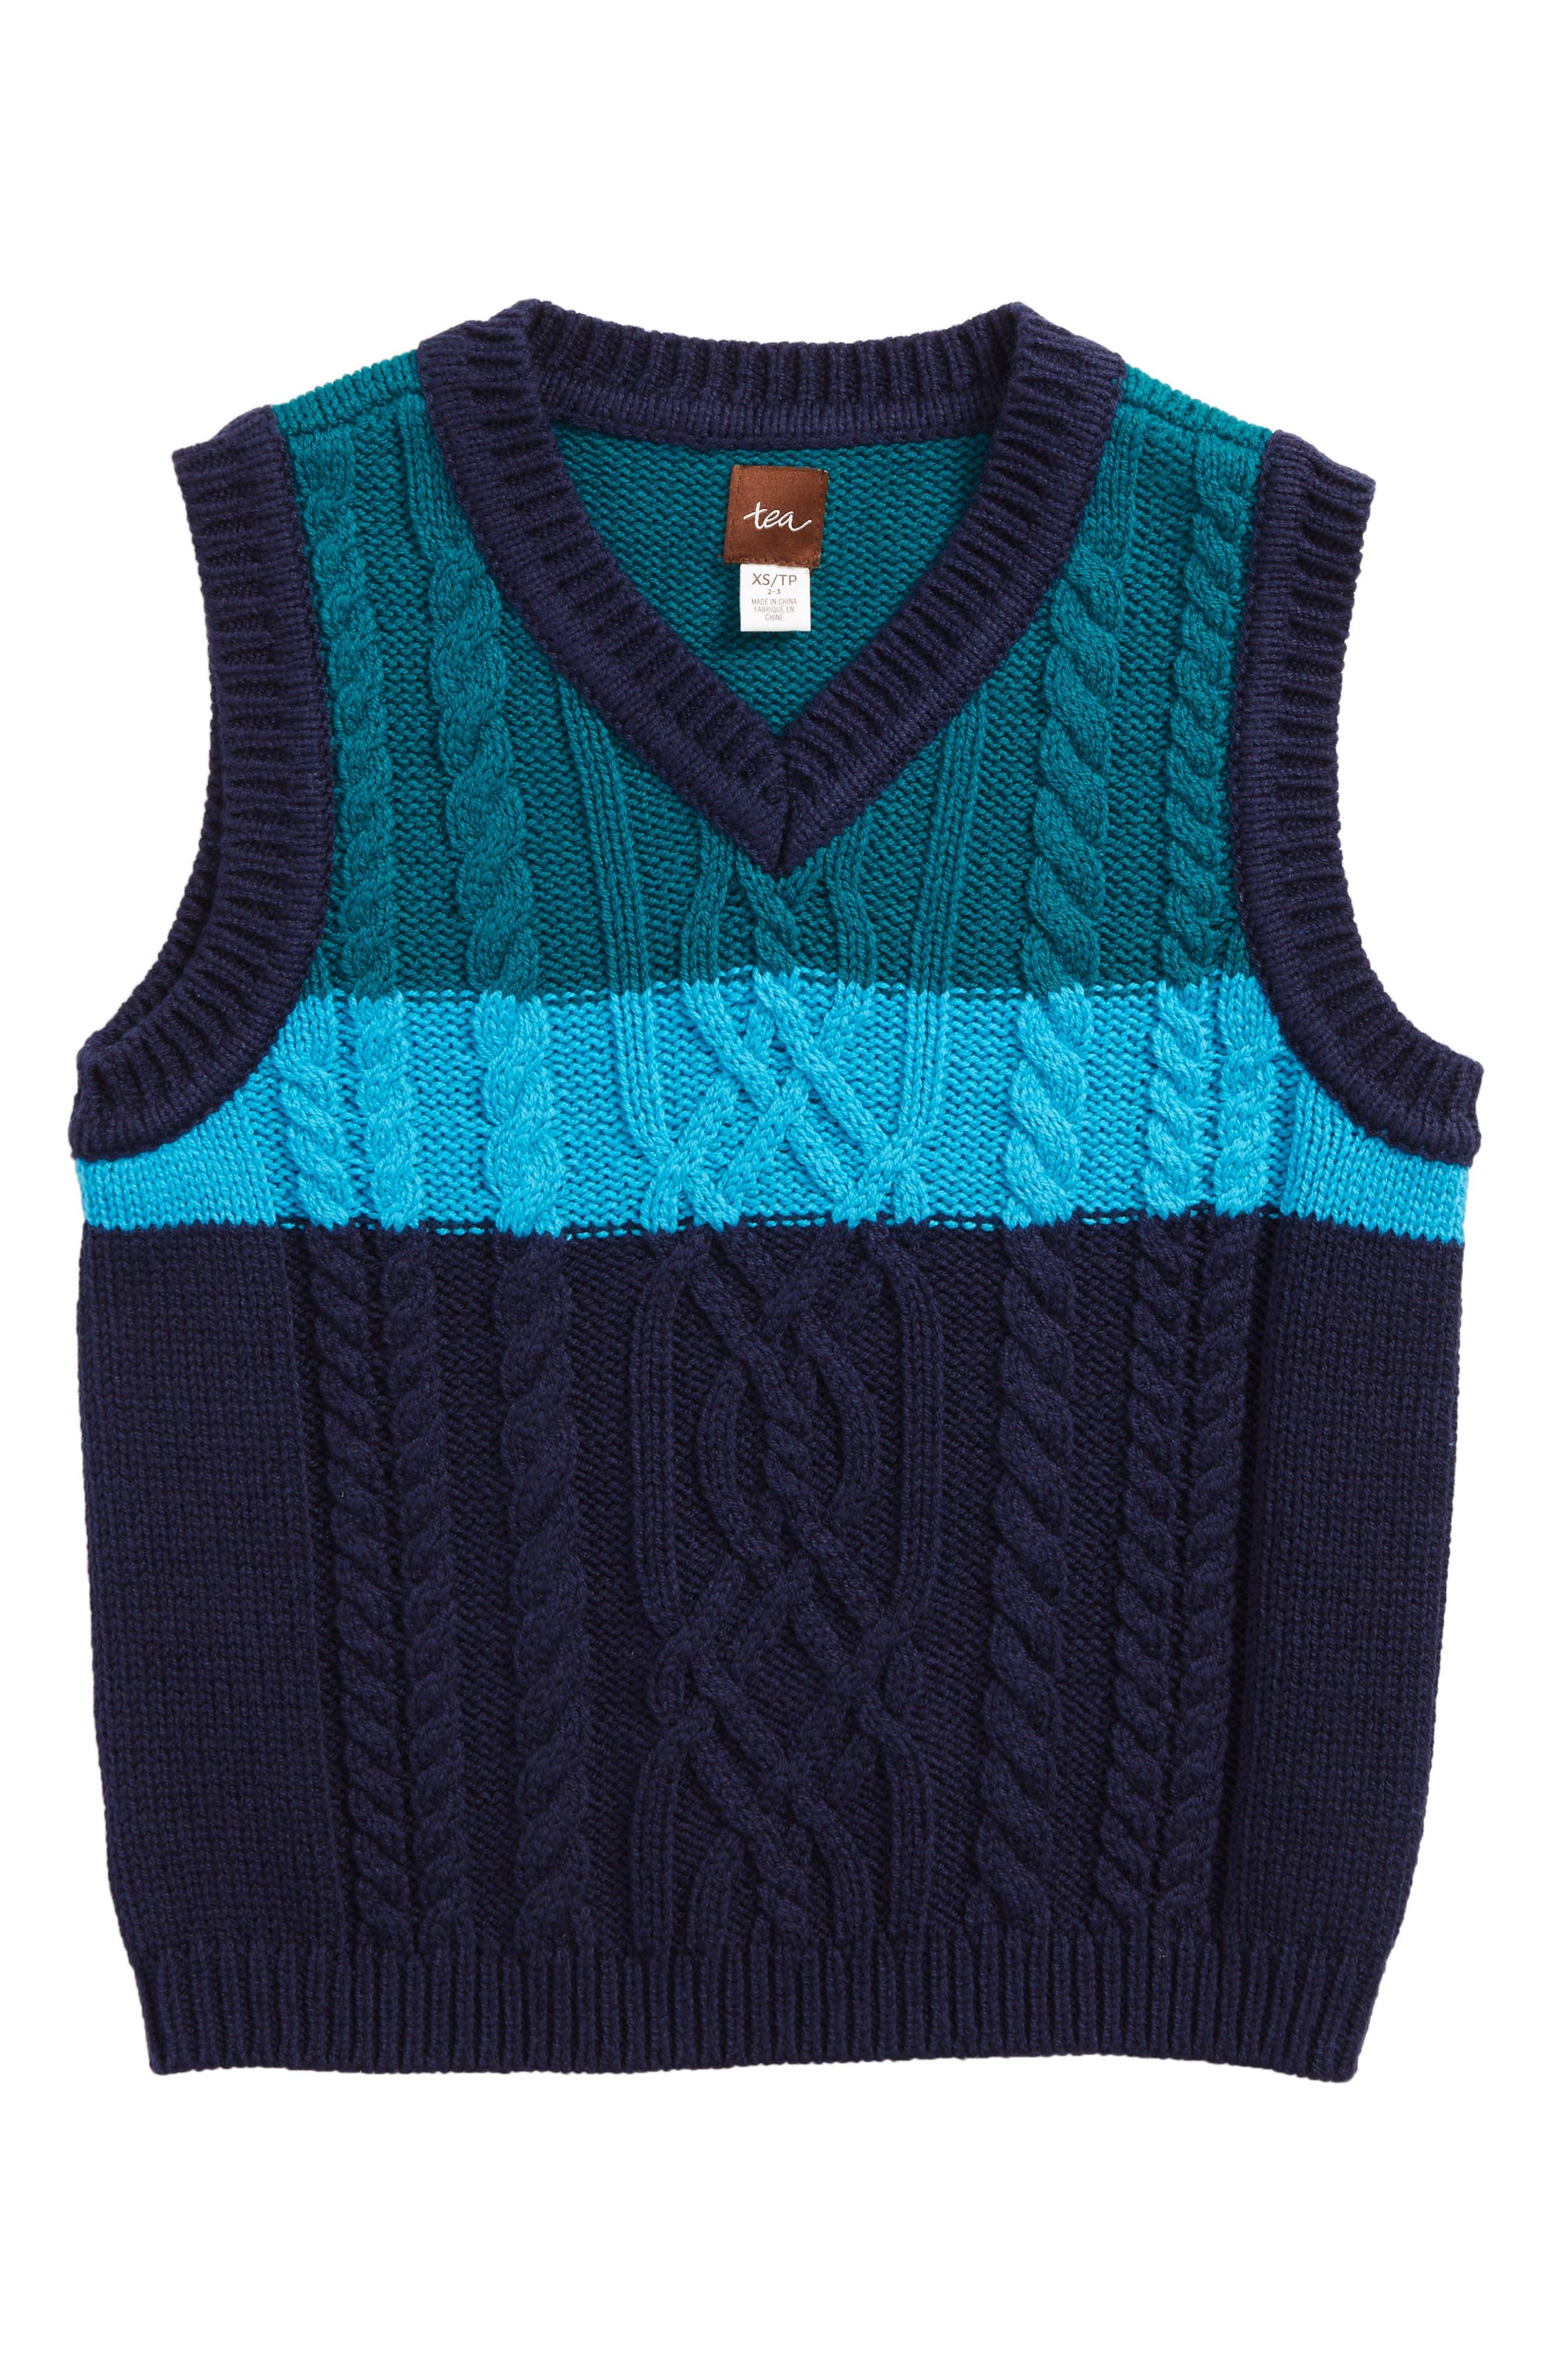 Alternate Image 1 Selected - Tea Collection Edan Cable Knit Sweater Vest (Toddler Boys, Little Boys & Big Boys)